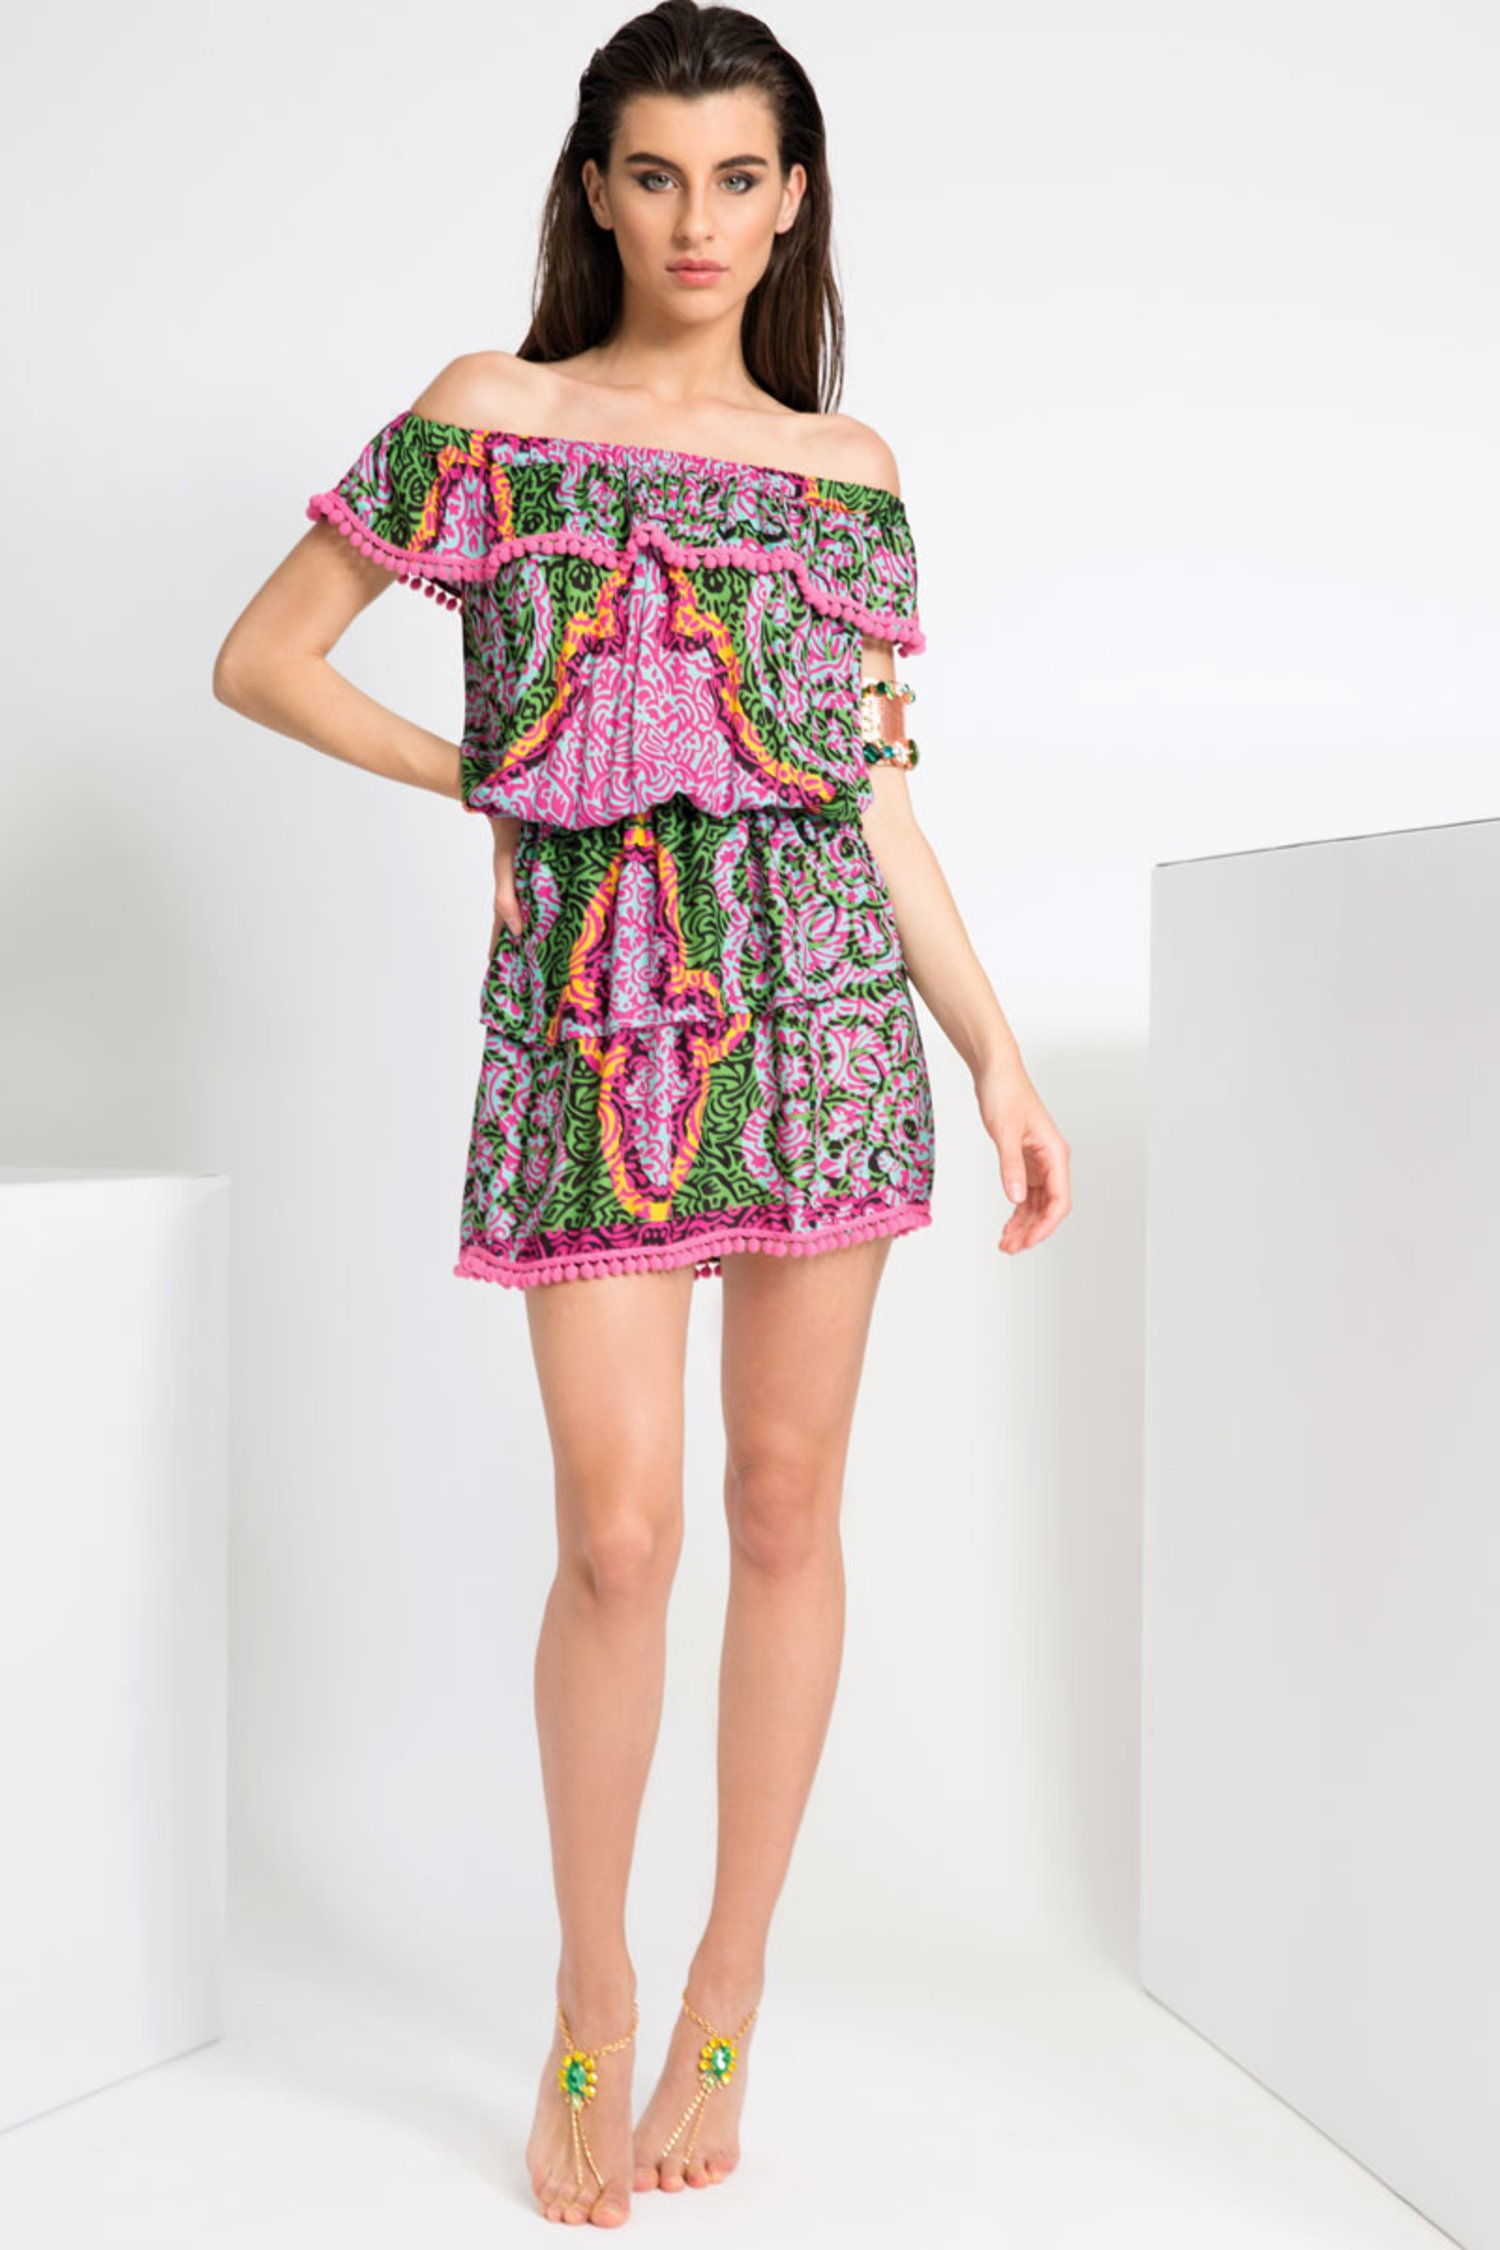 PRINTED VISCOSE SHORT DRESS WITH FRILLS AND POM-POM - India Pop Fuxia